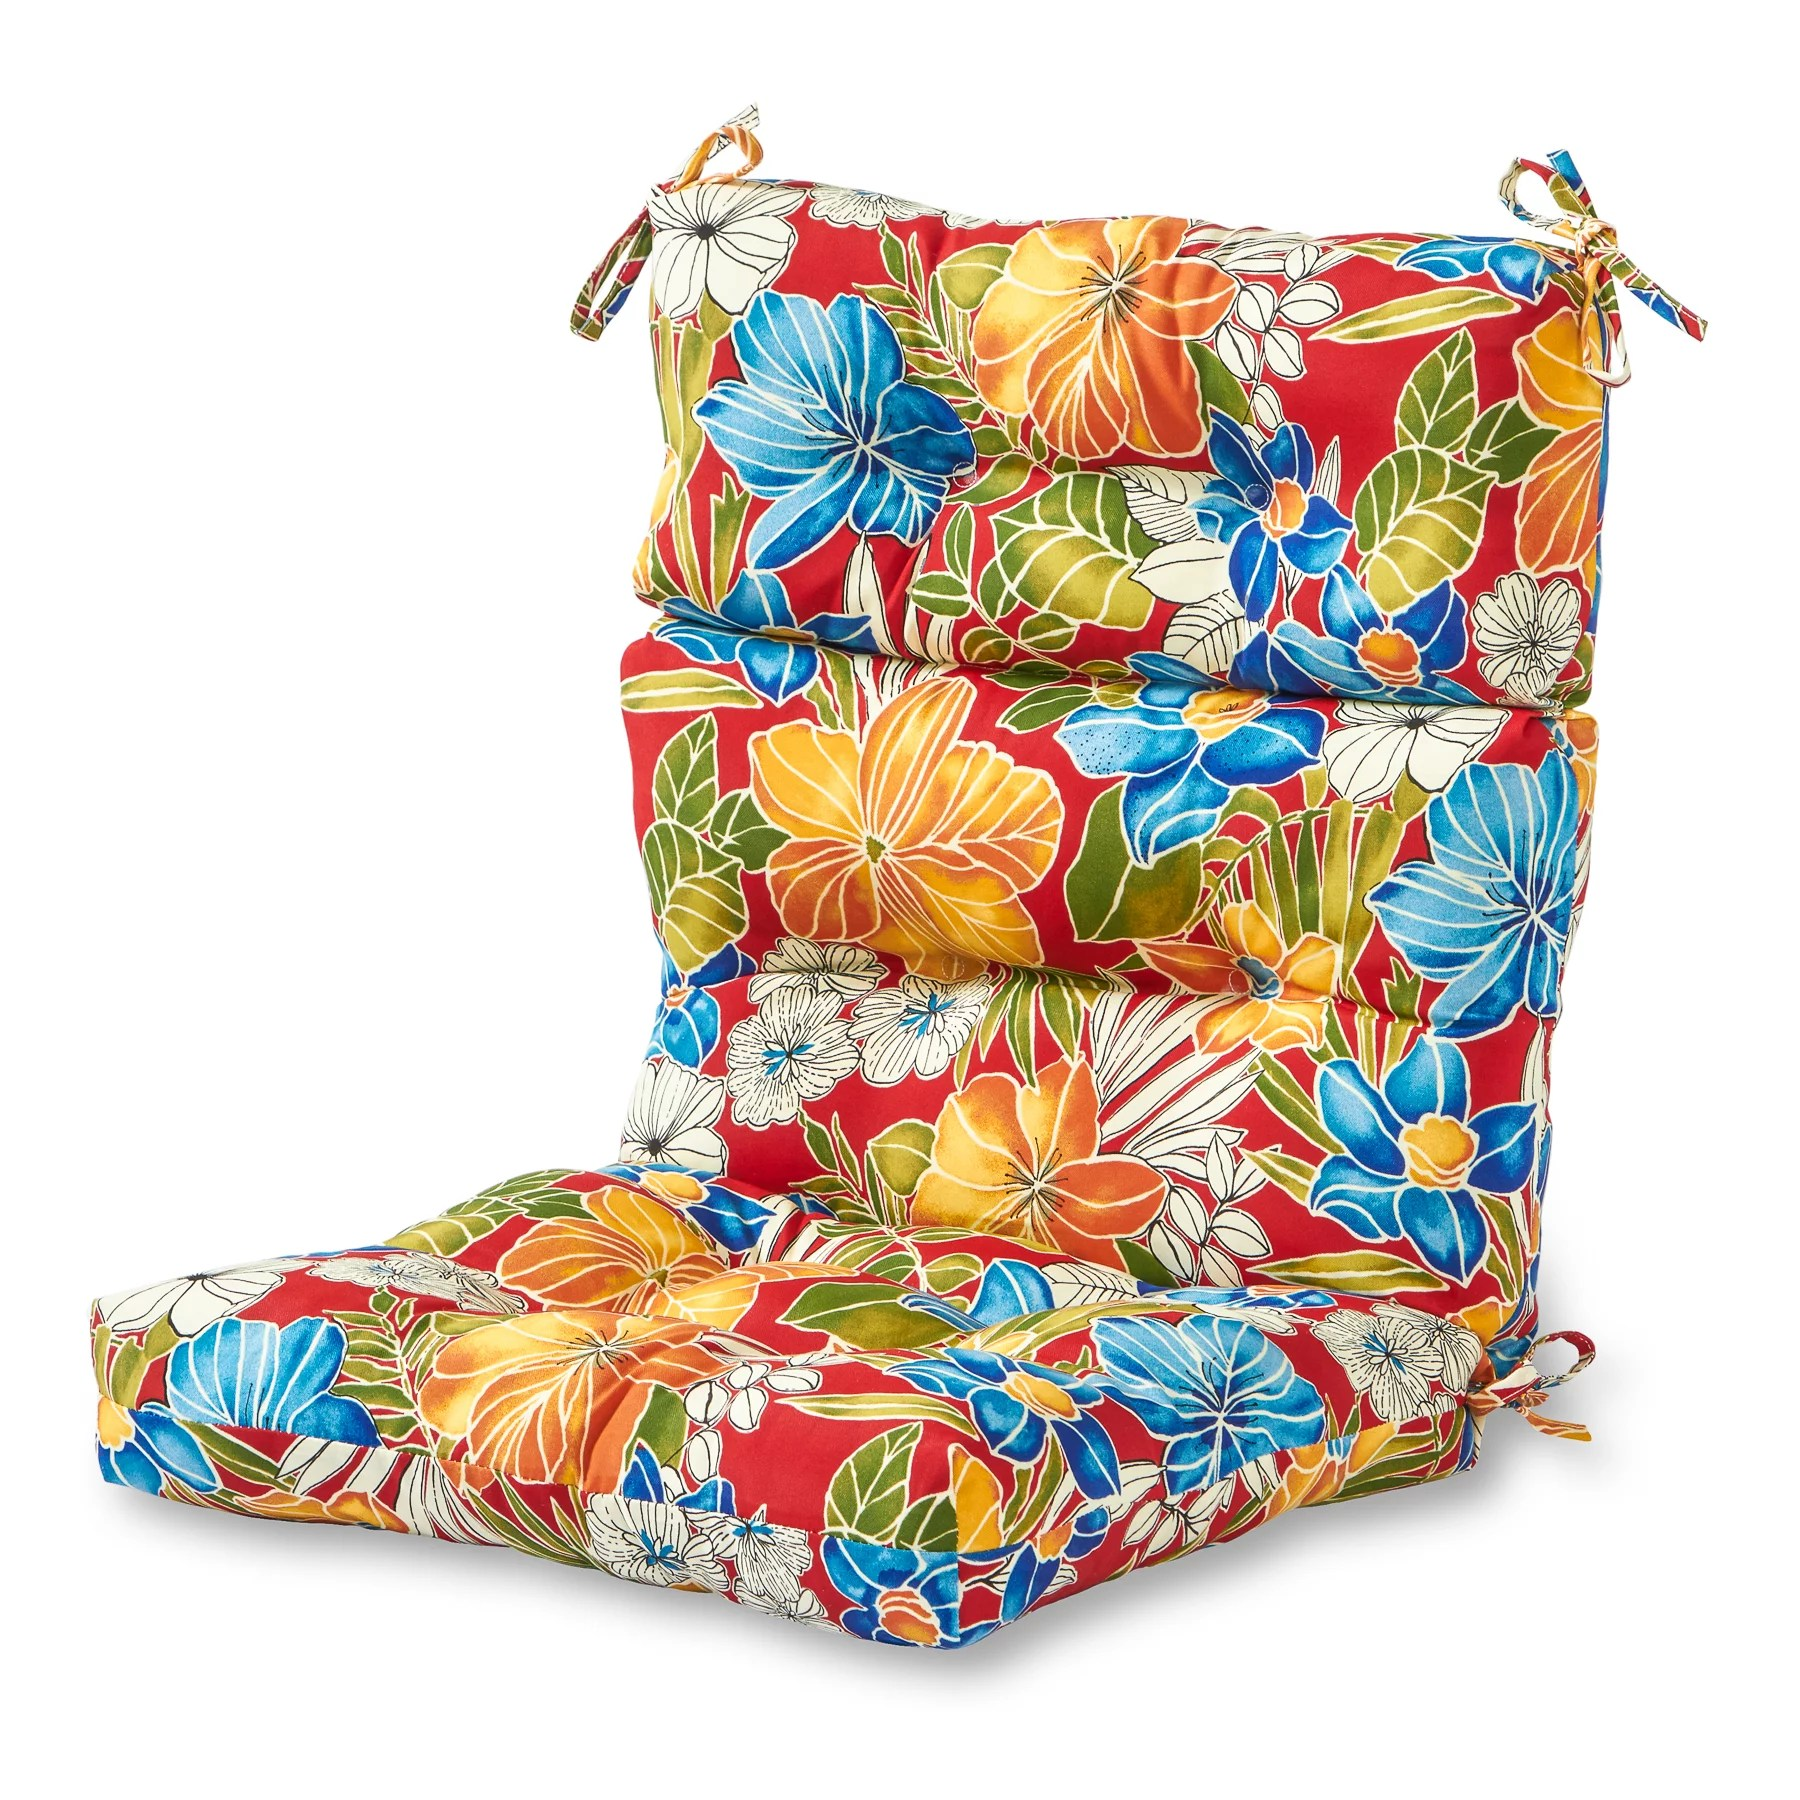 greendale home fashions aloha floral outdoor high back chair cushion